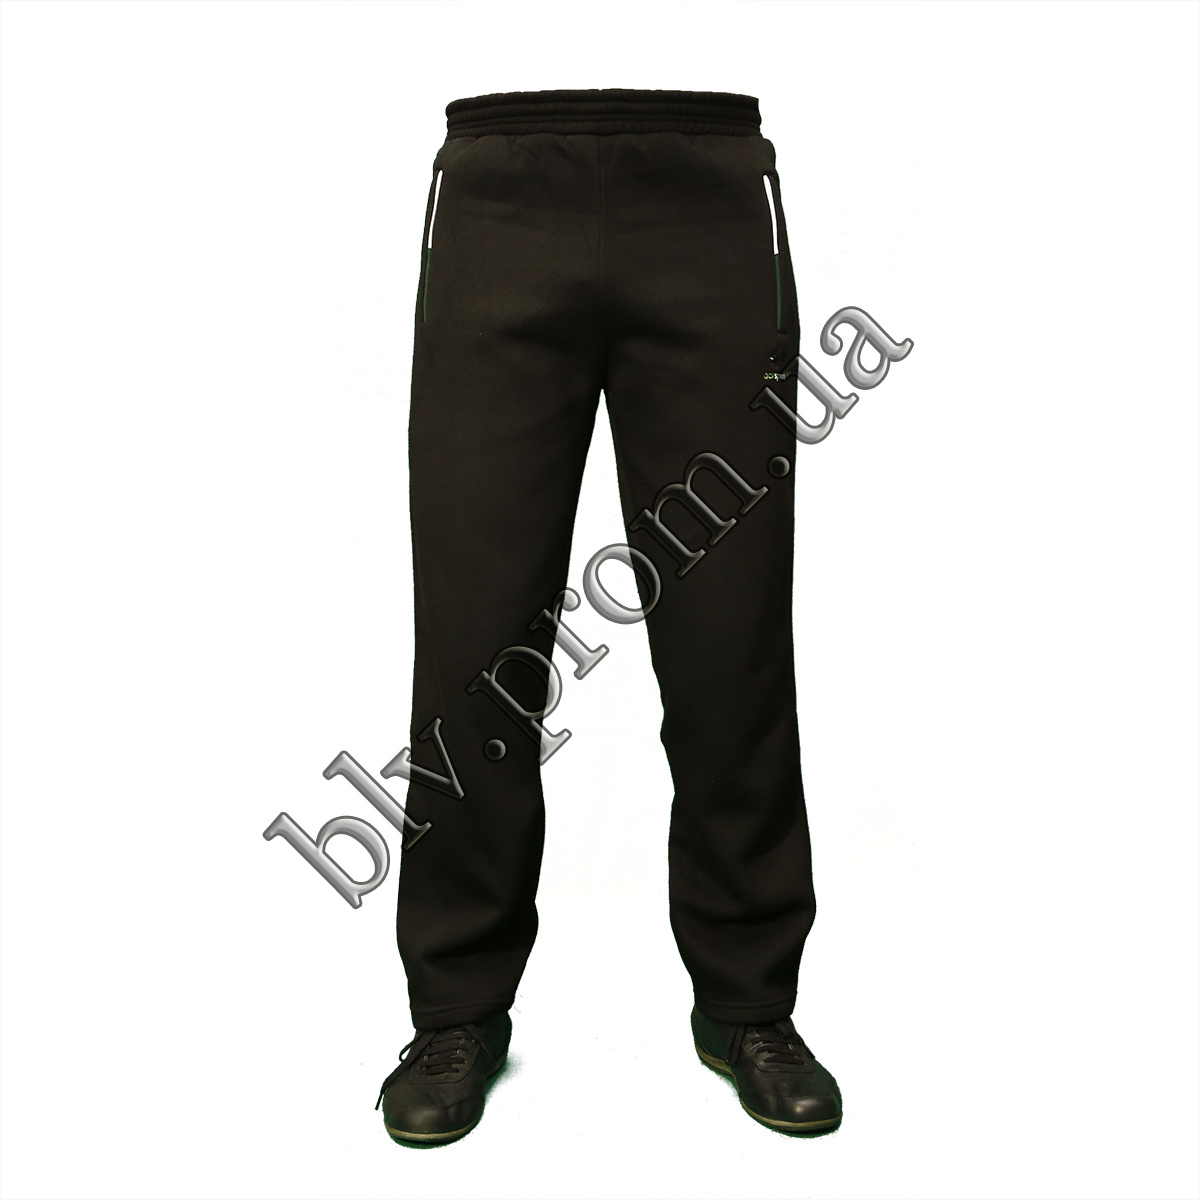 Теплые мужские брюки байка пр-во Турция KD877 Black